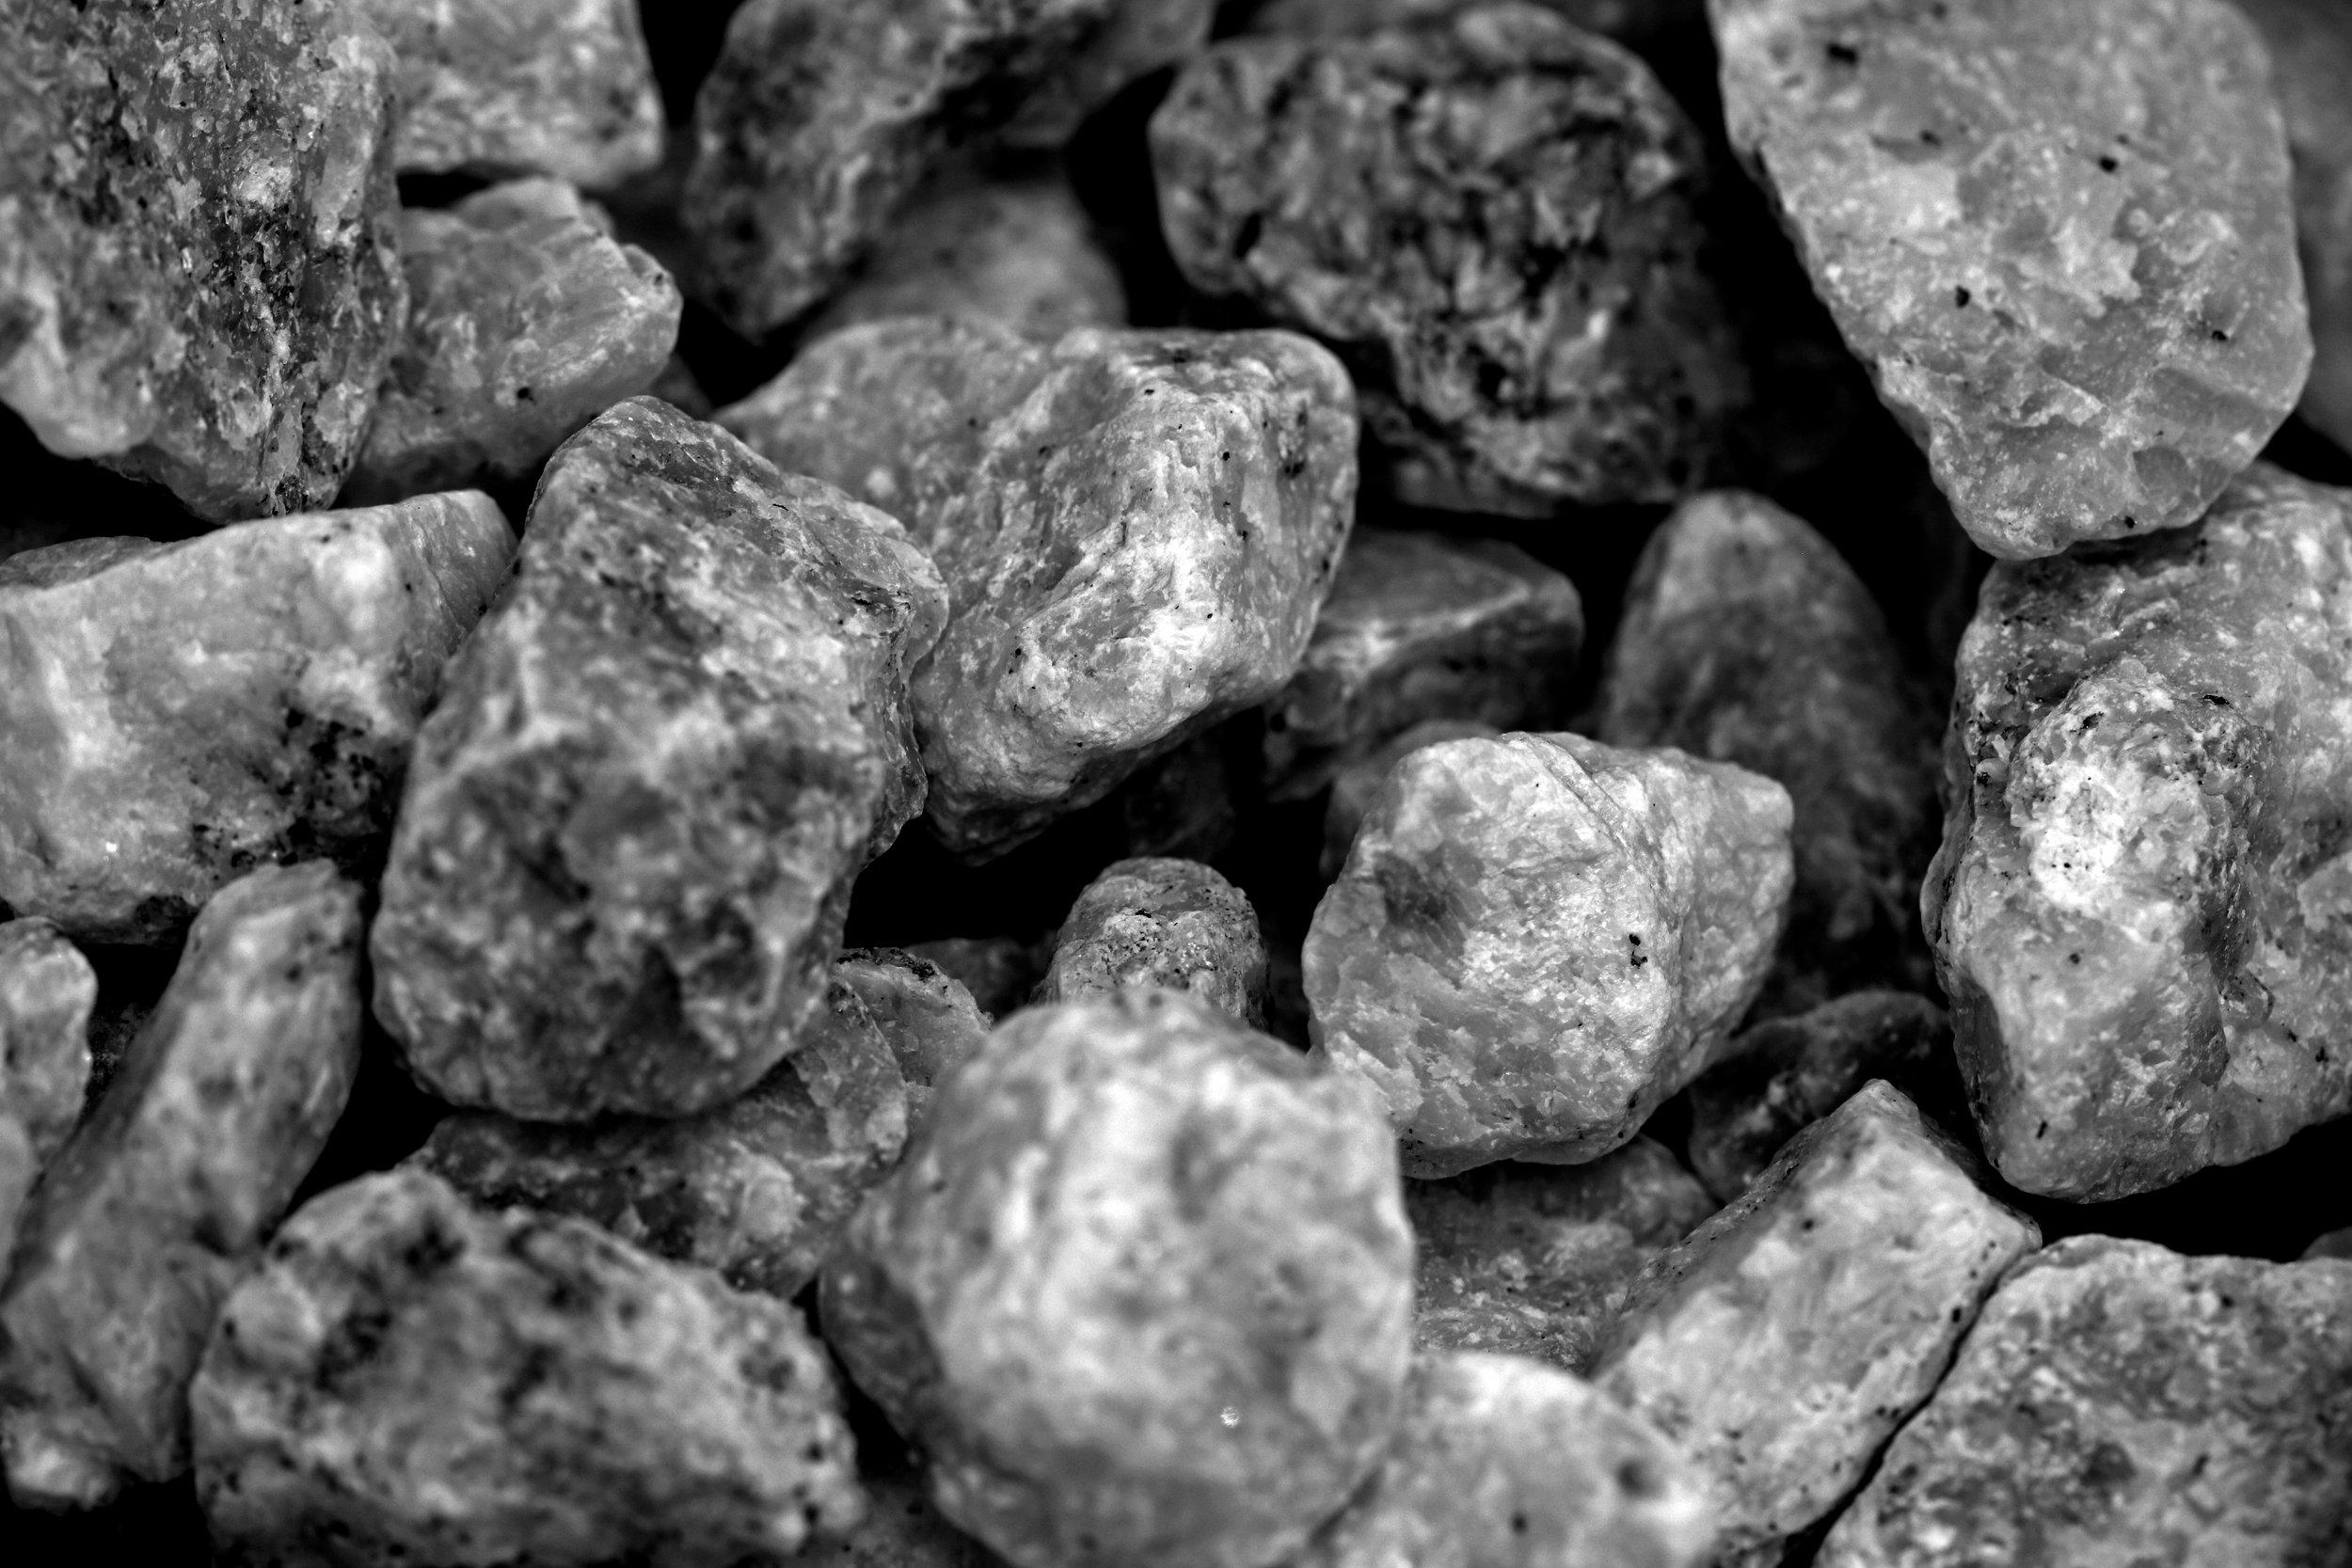 b&w rocks.jpg